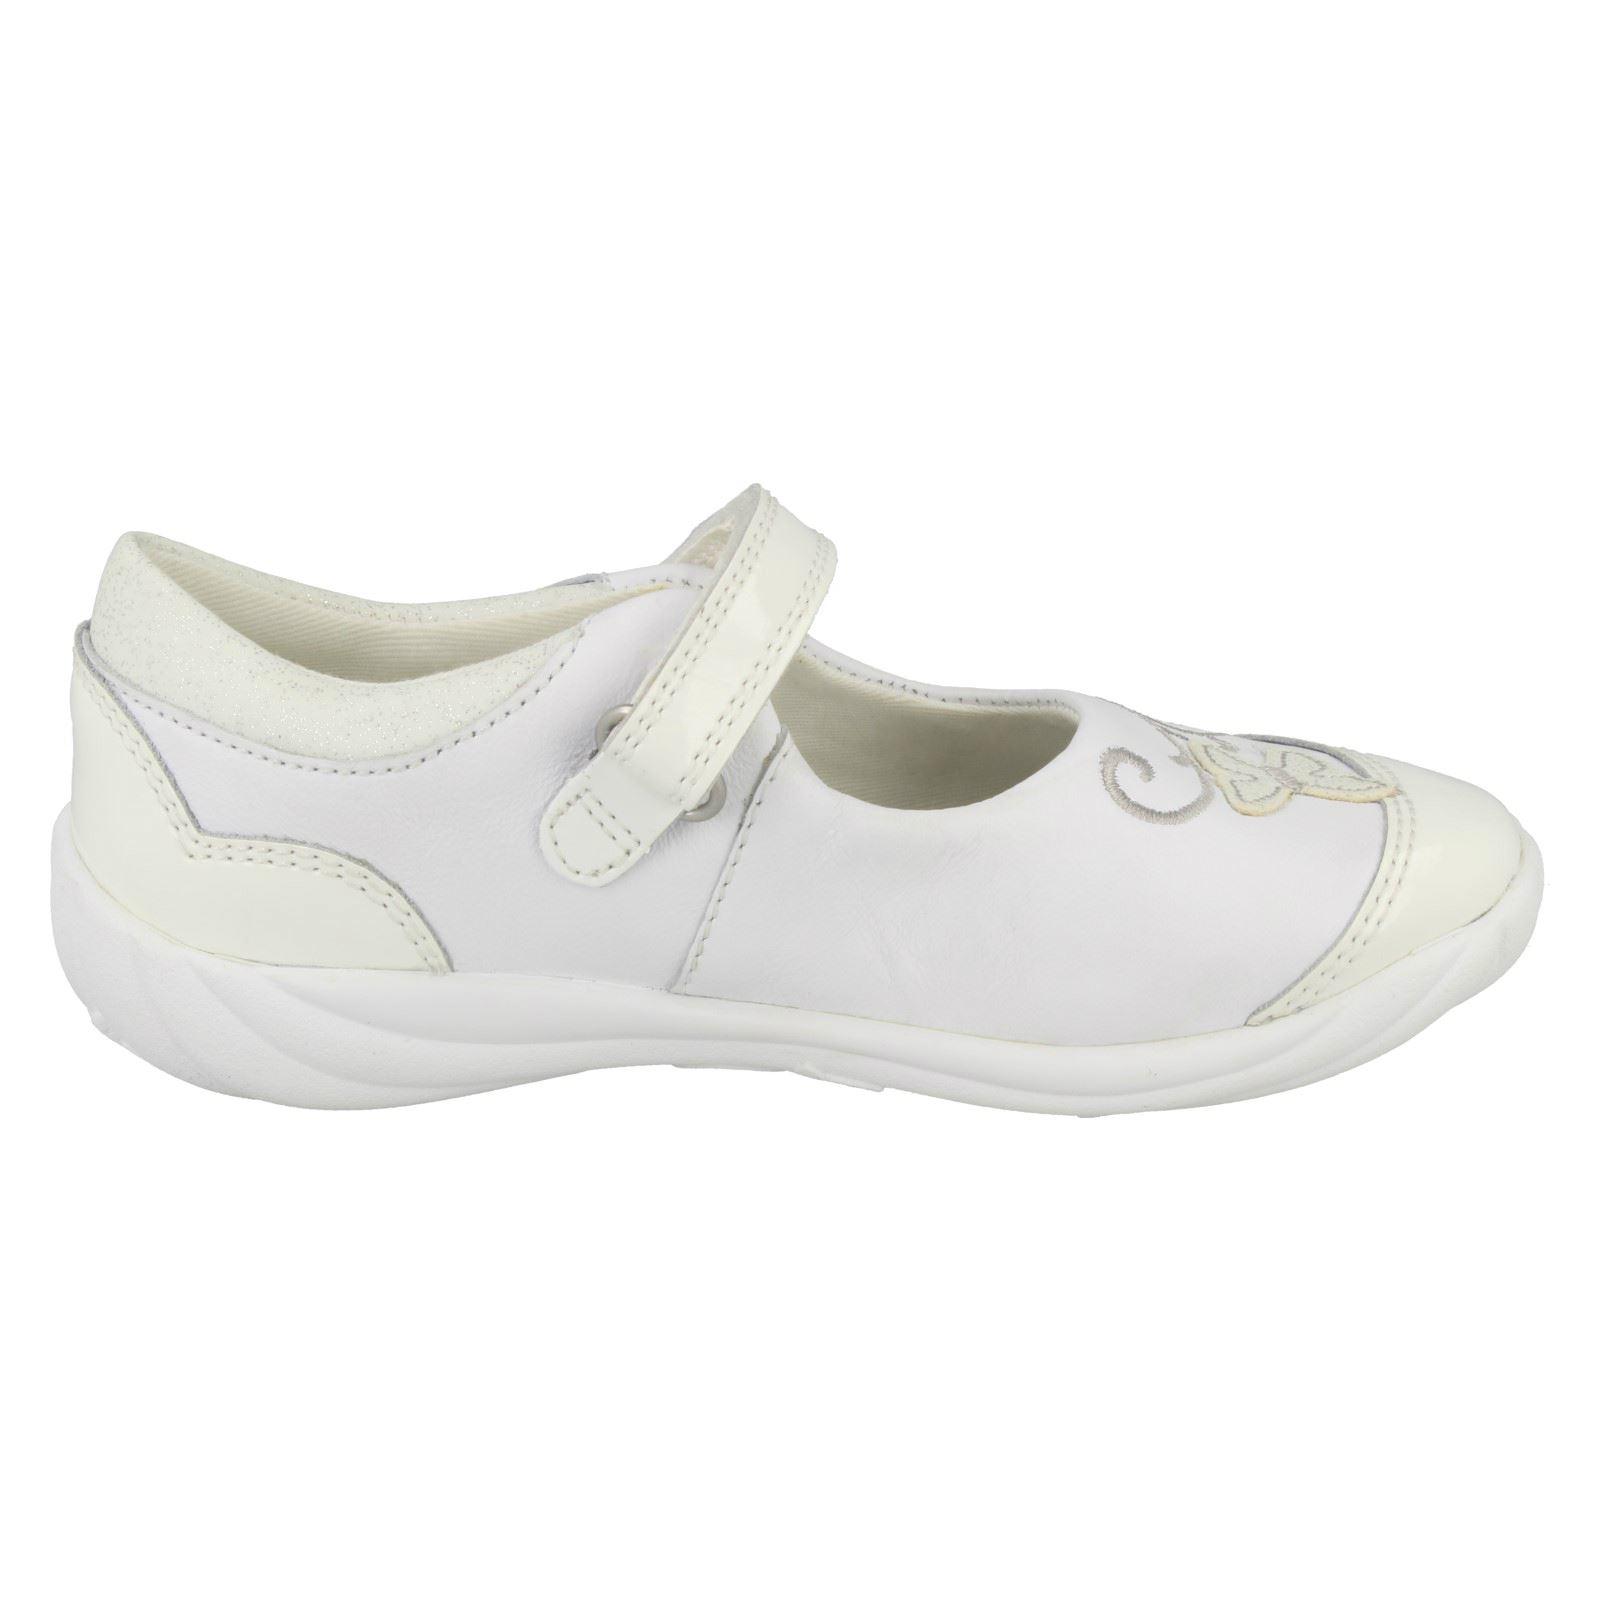 Clarks Girls Shoes - Golda Ray